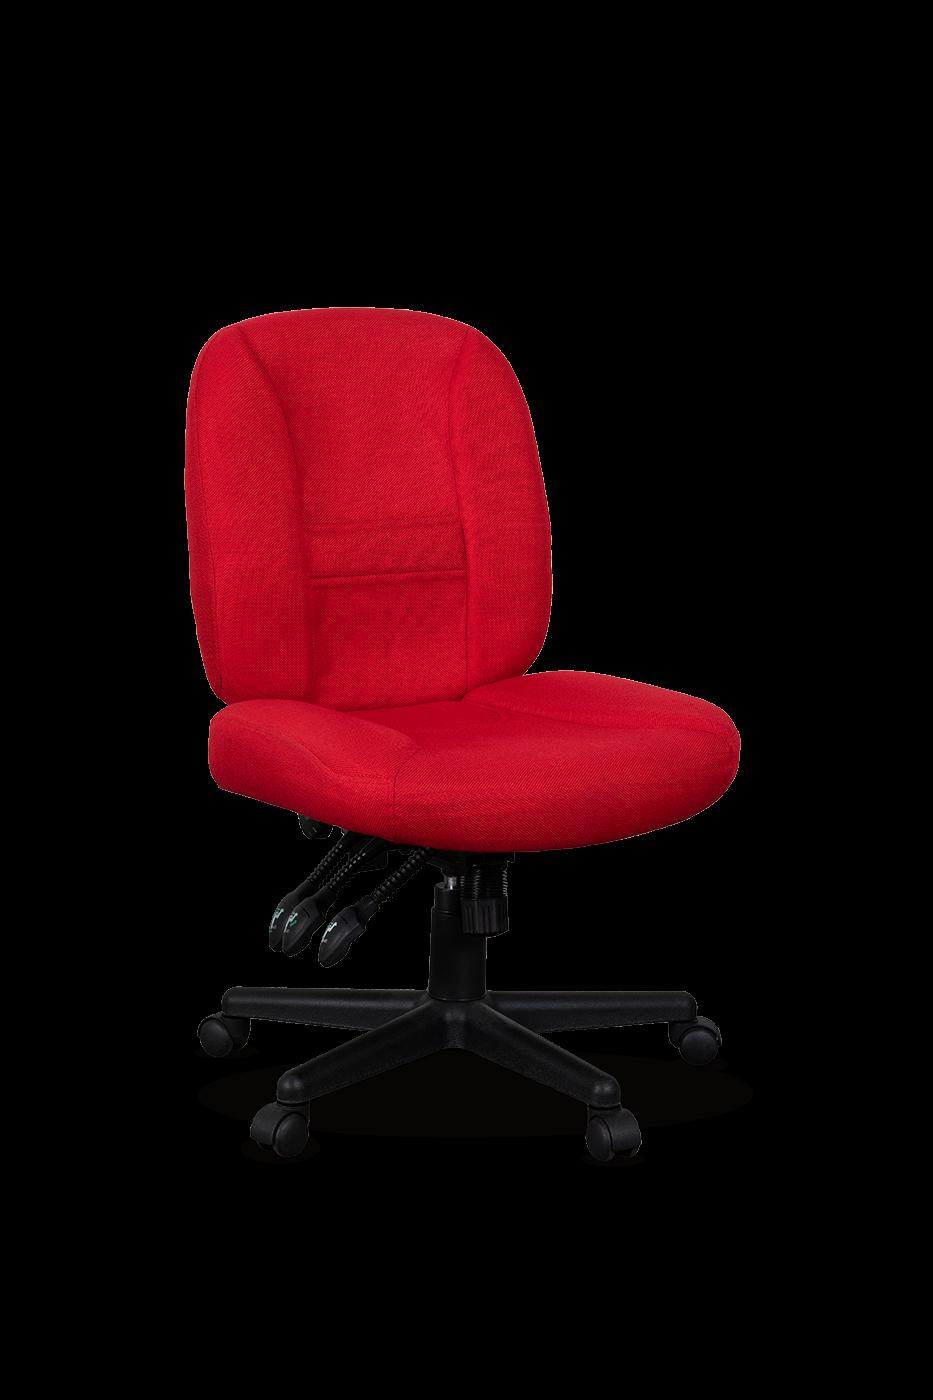 Bernina NEW Red Chair